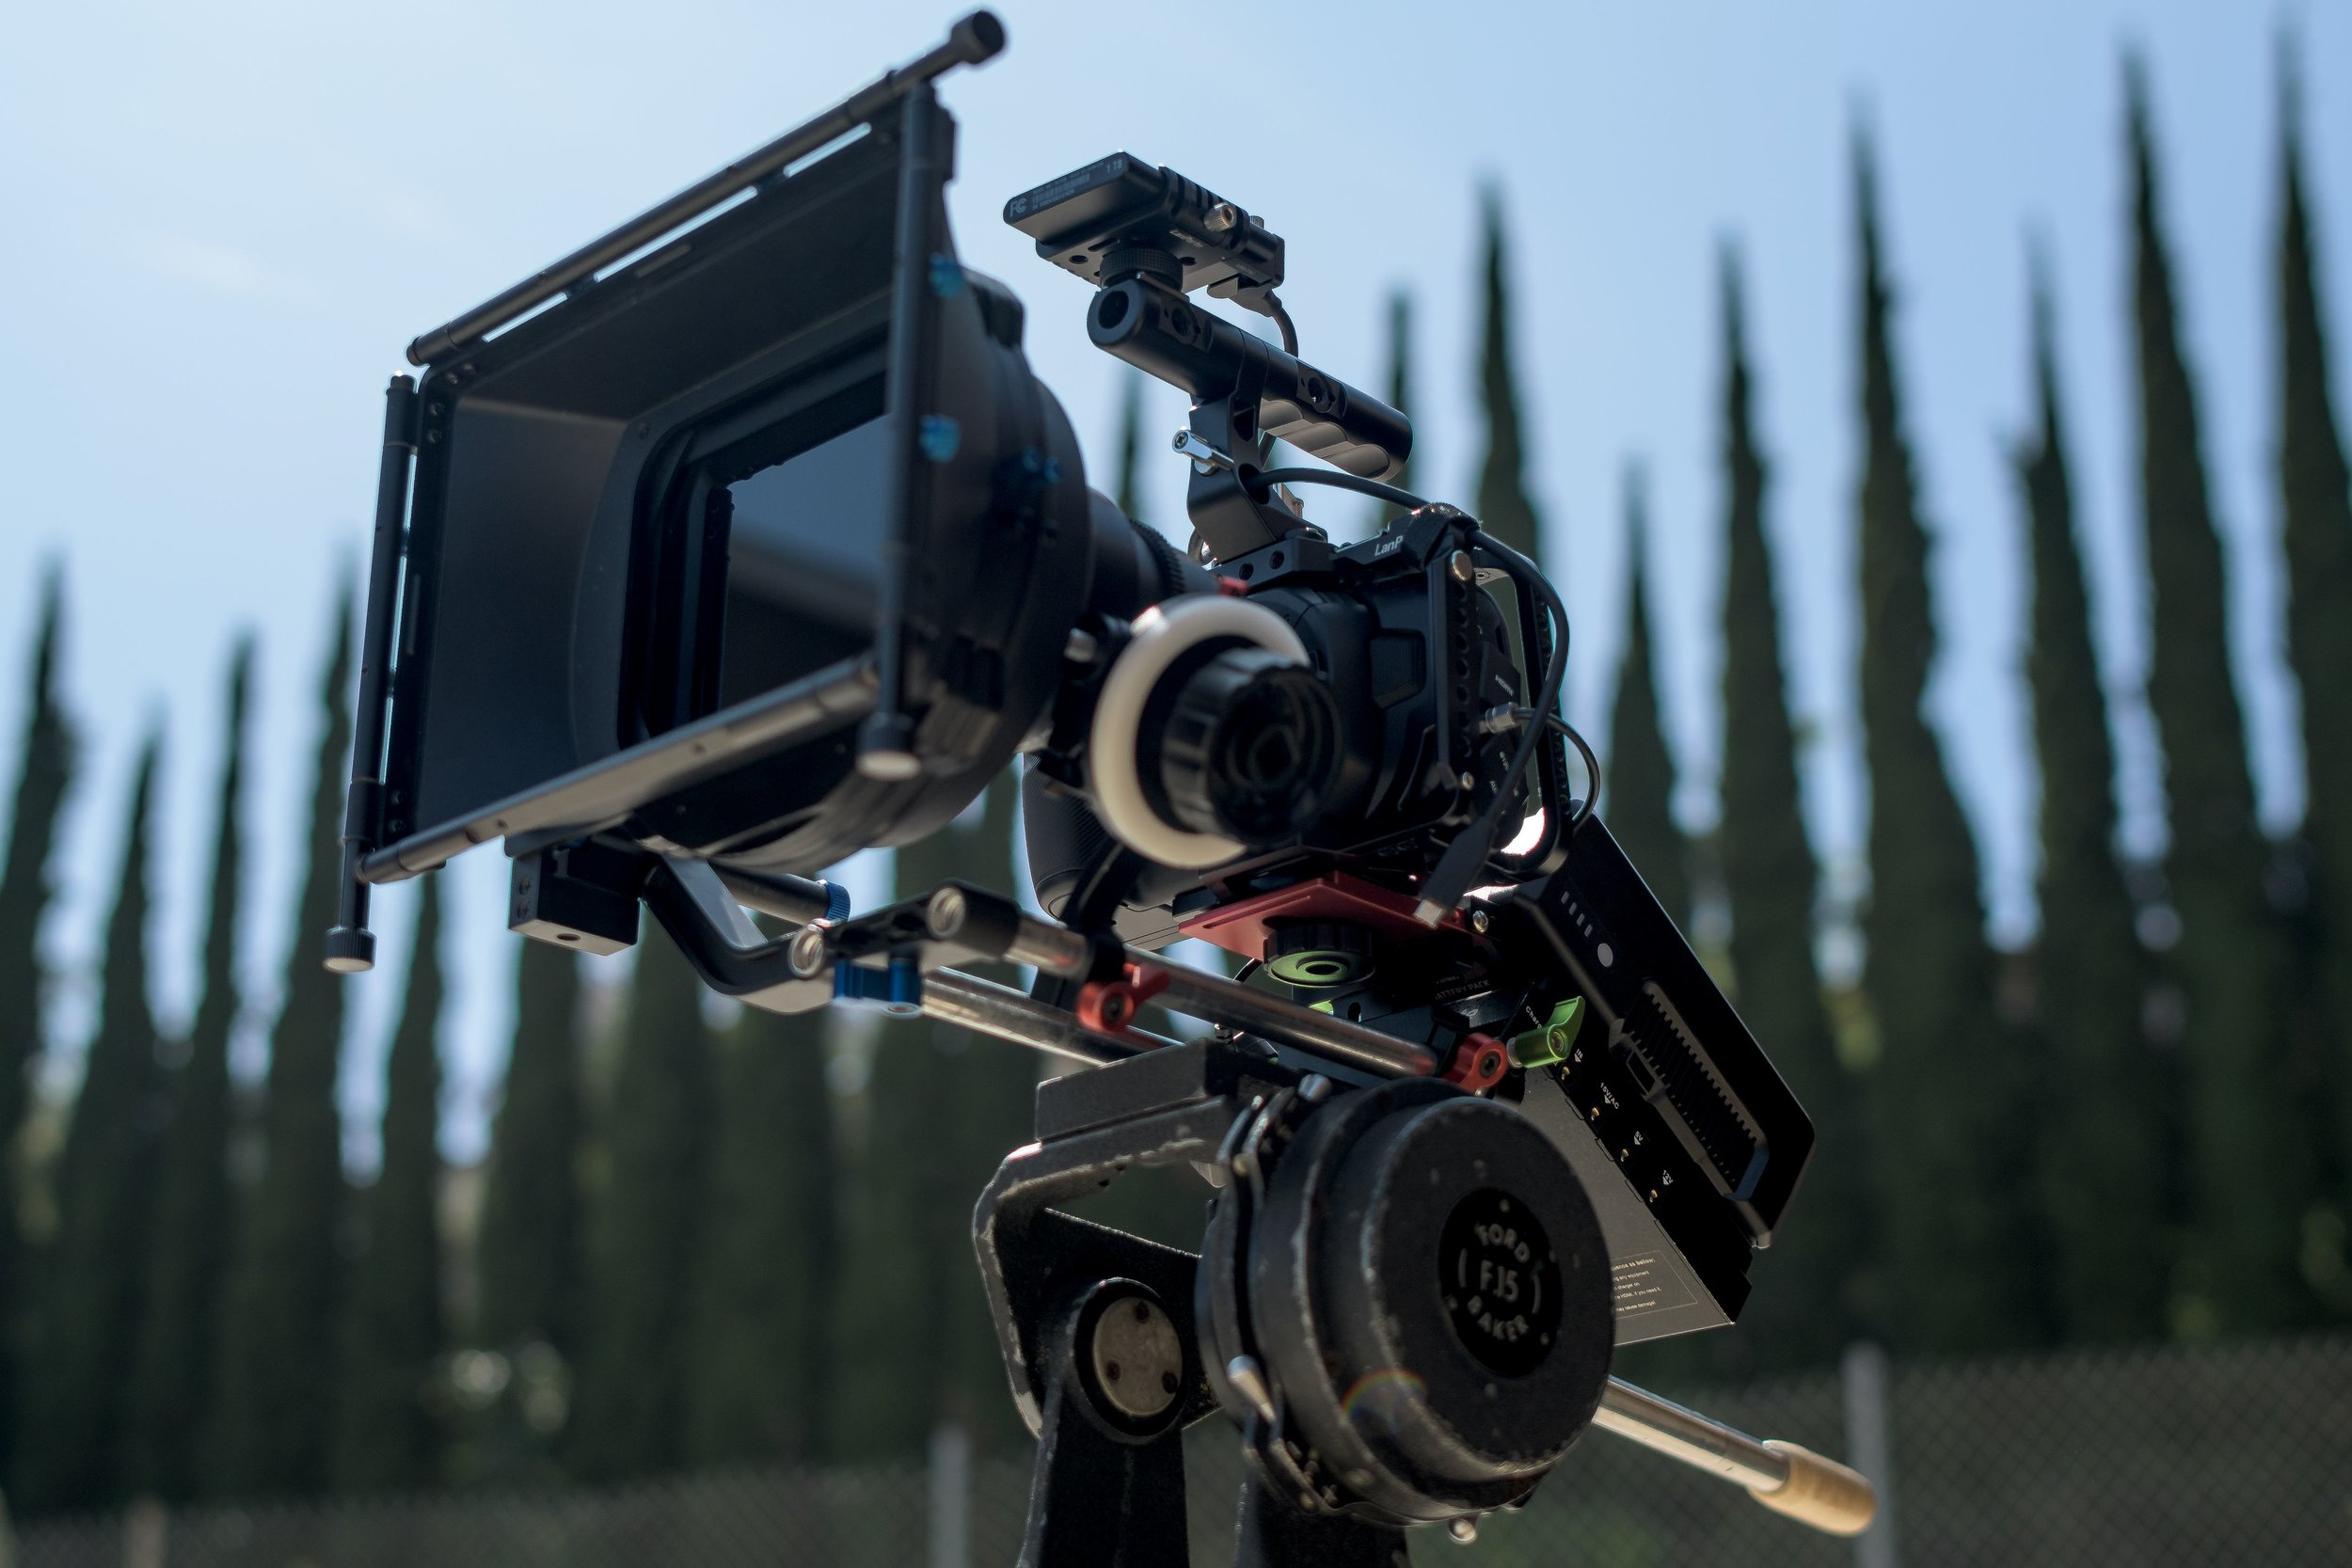 Blackmagic Pocket Cinema Camera 4k build